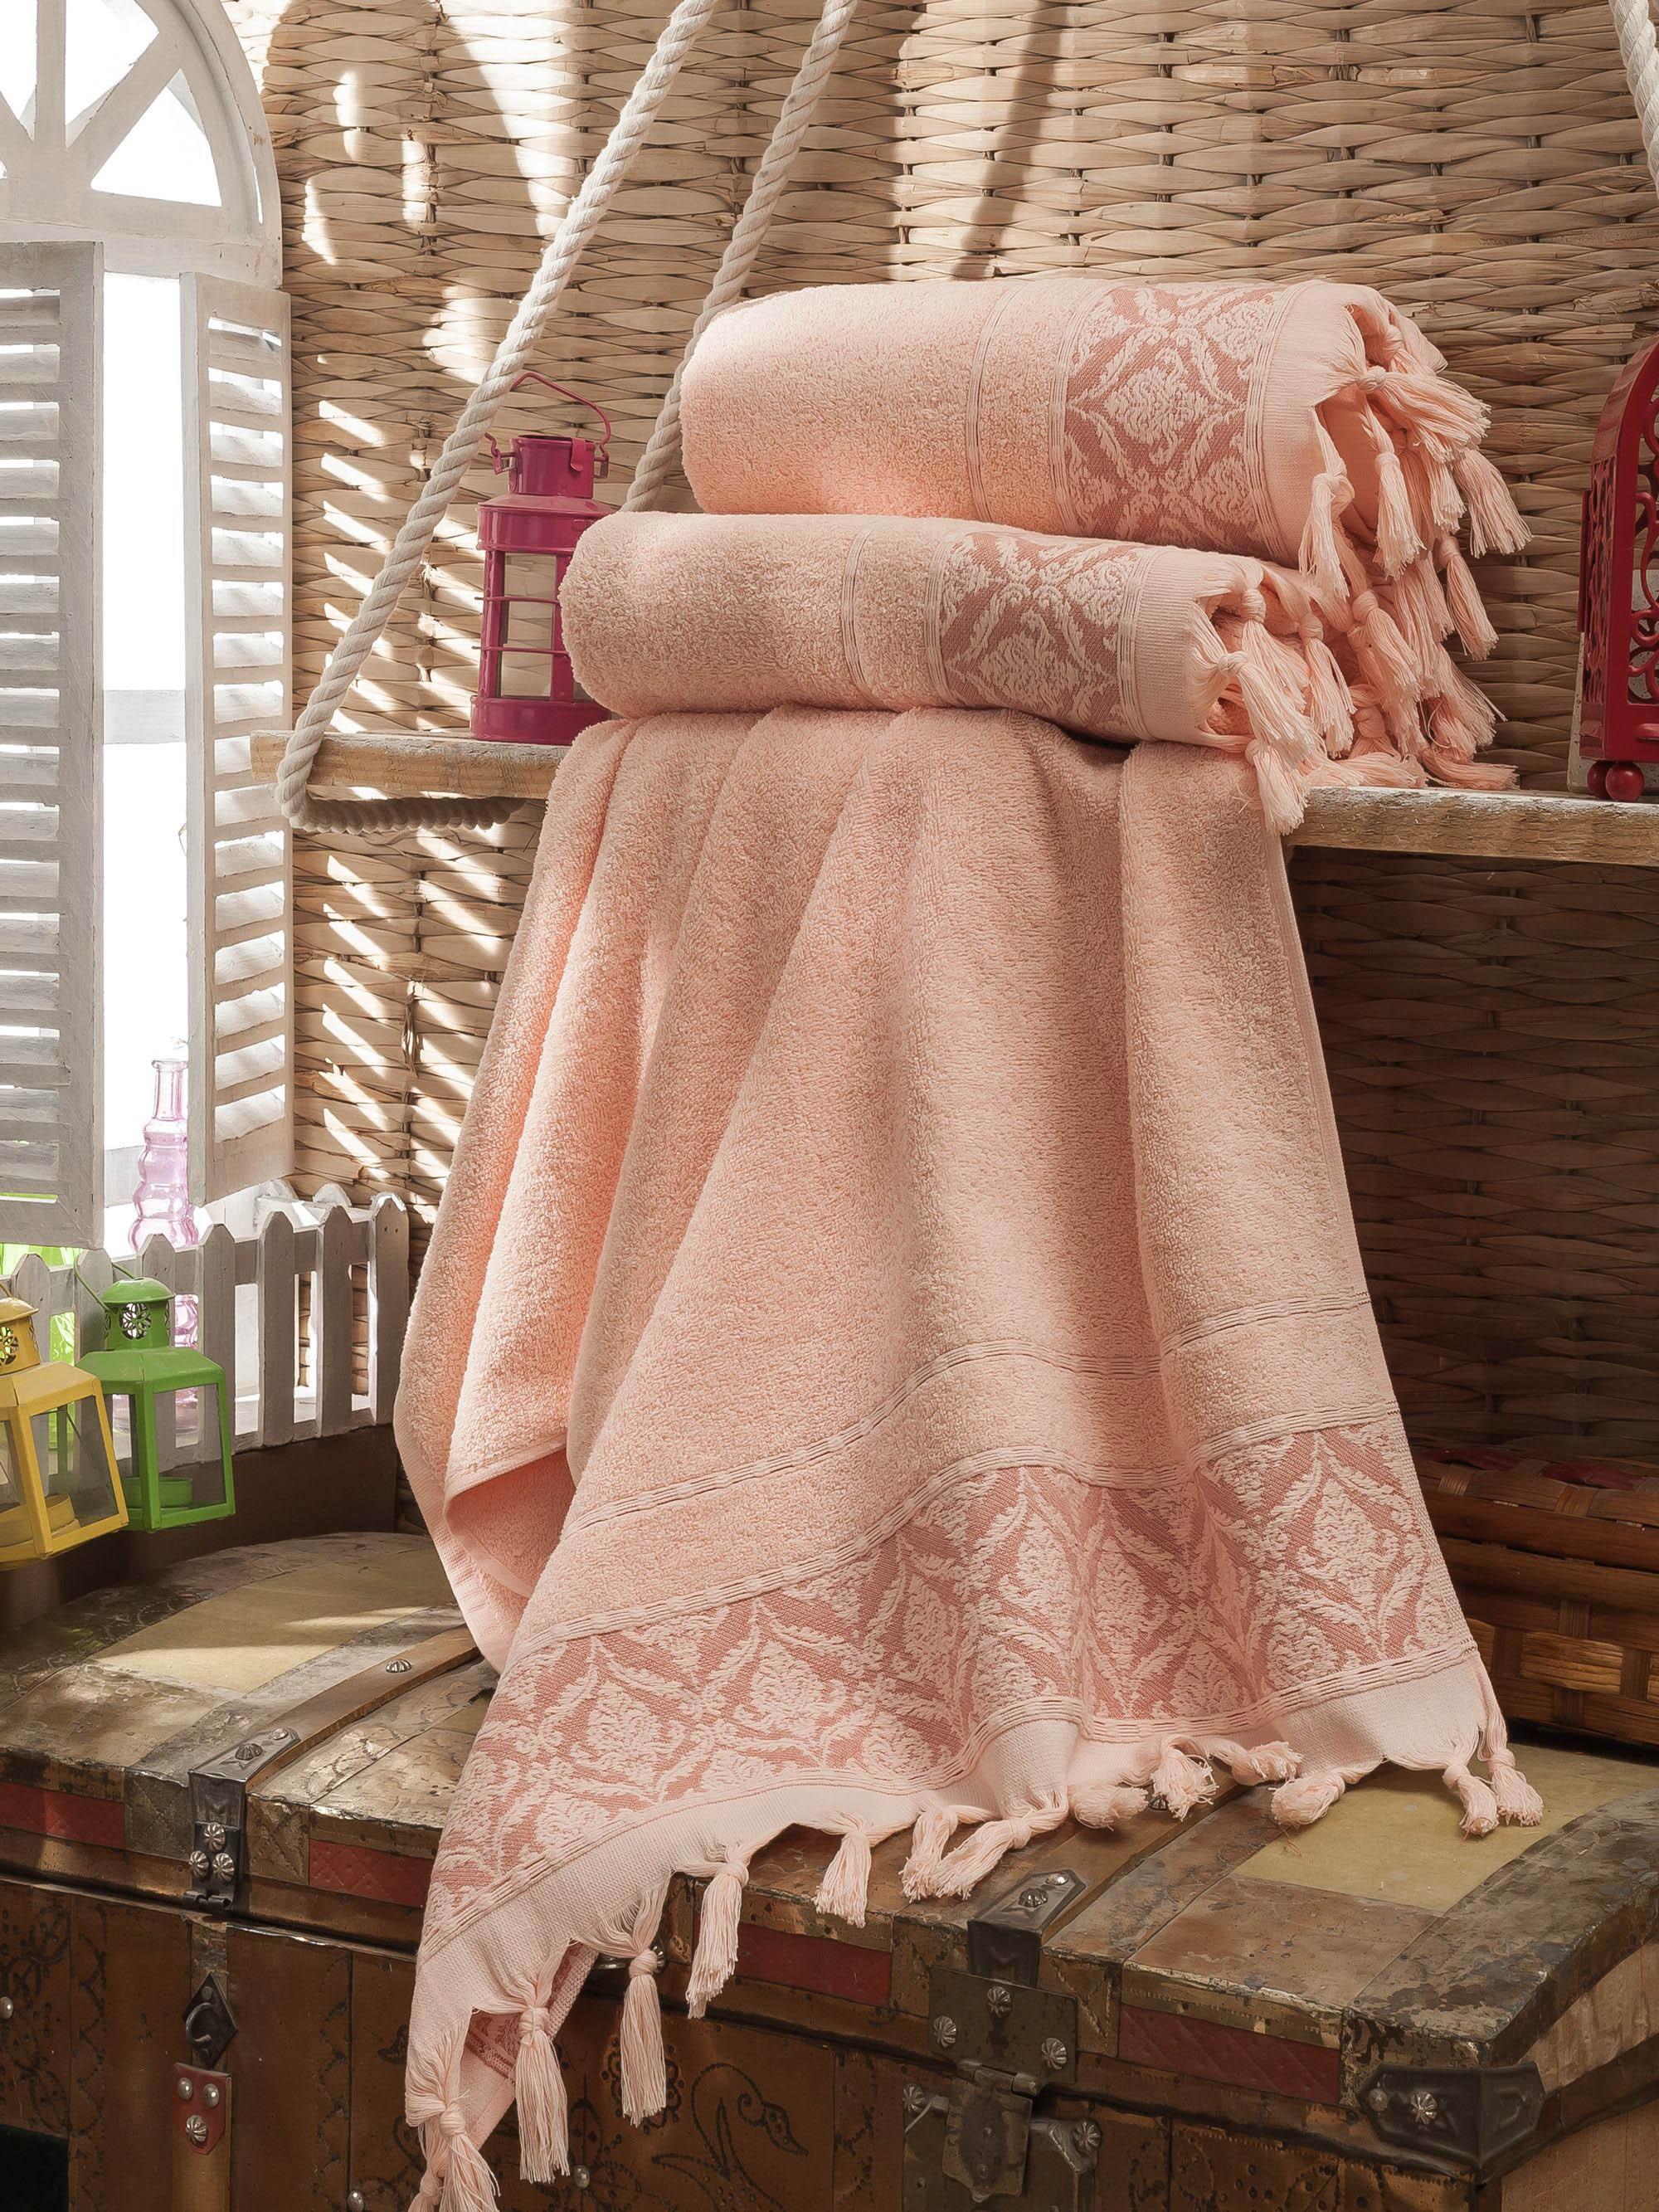 DO'n'CO Набор Полотенец Janset Цвет: Розовый (70х140 см — 3 шт)